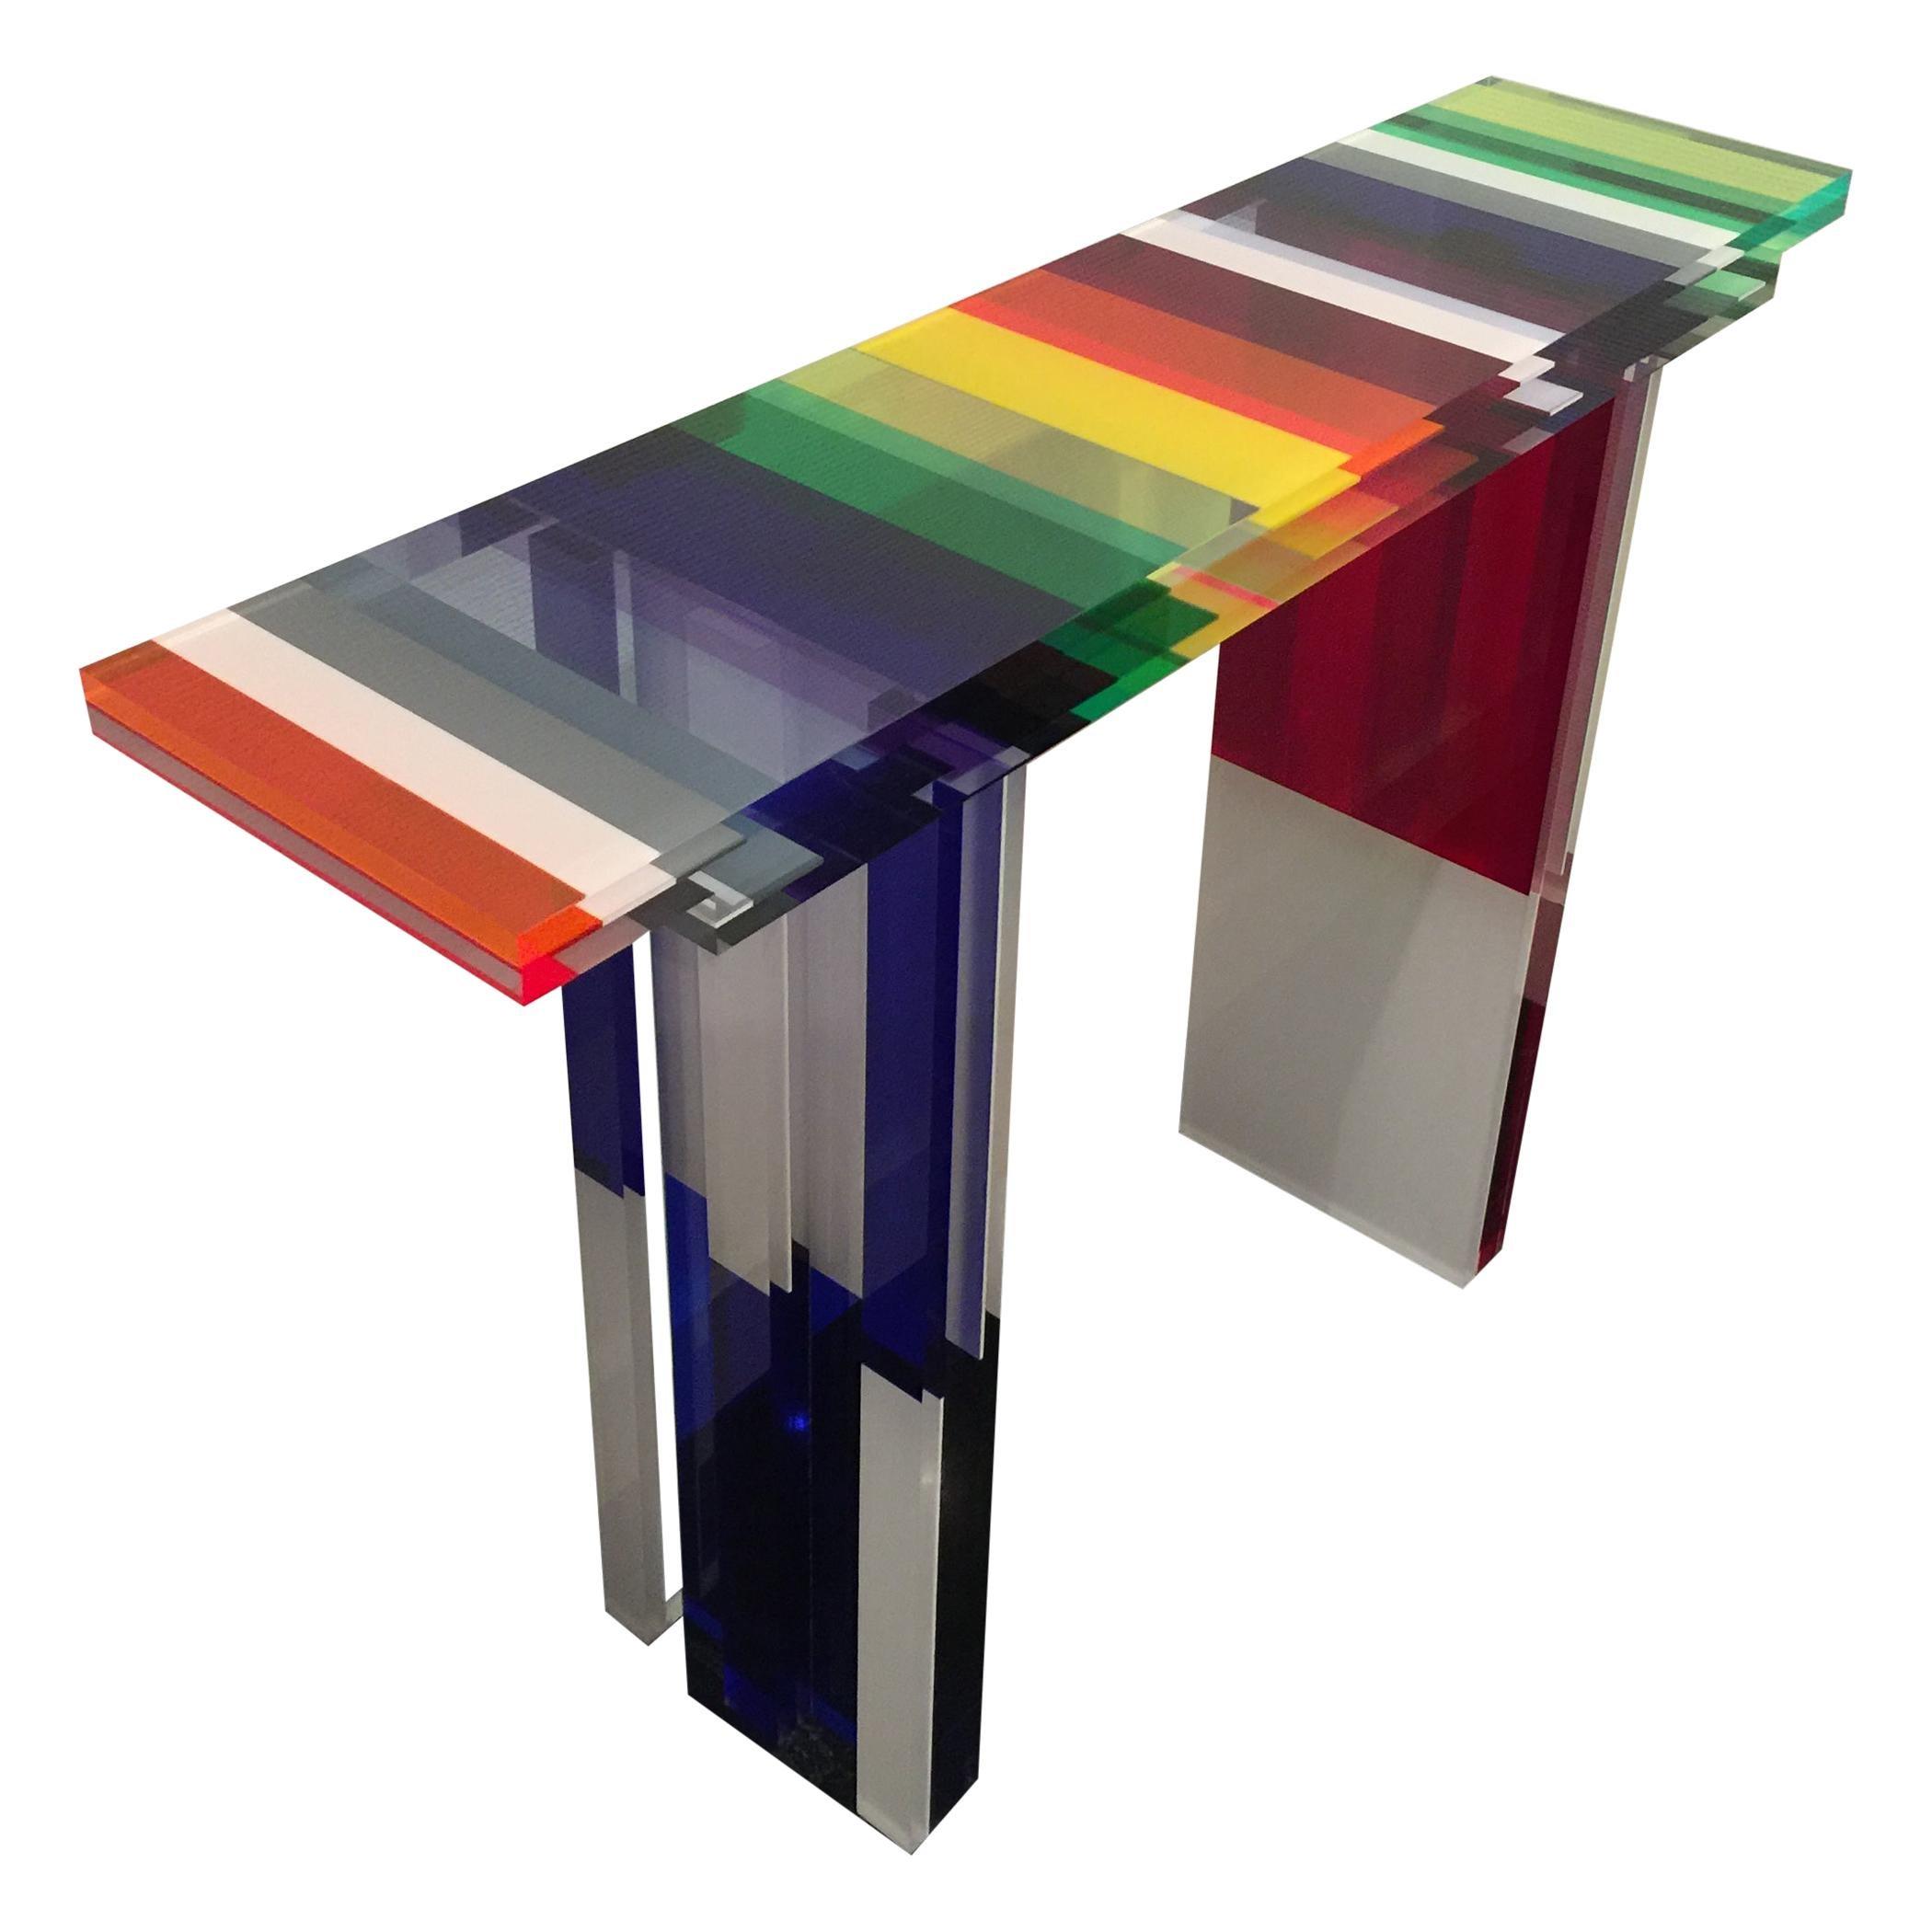 Charly Bounan, Unique Colorful Console